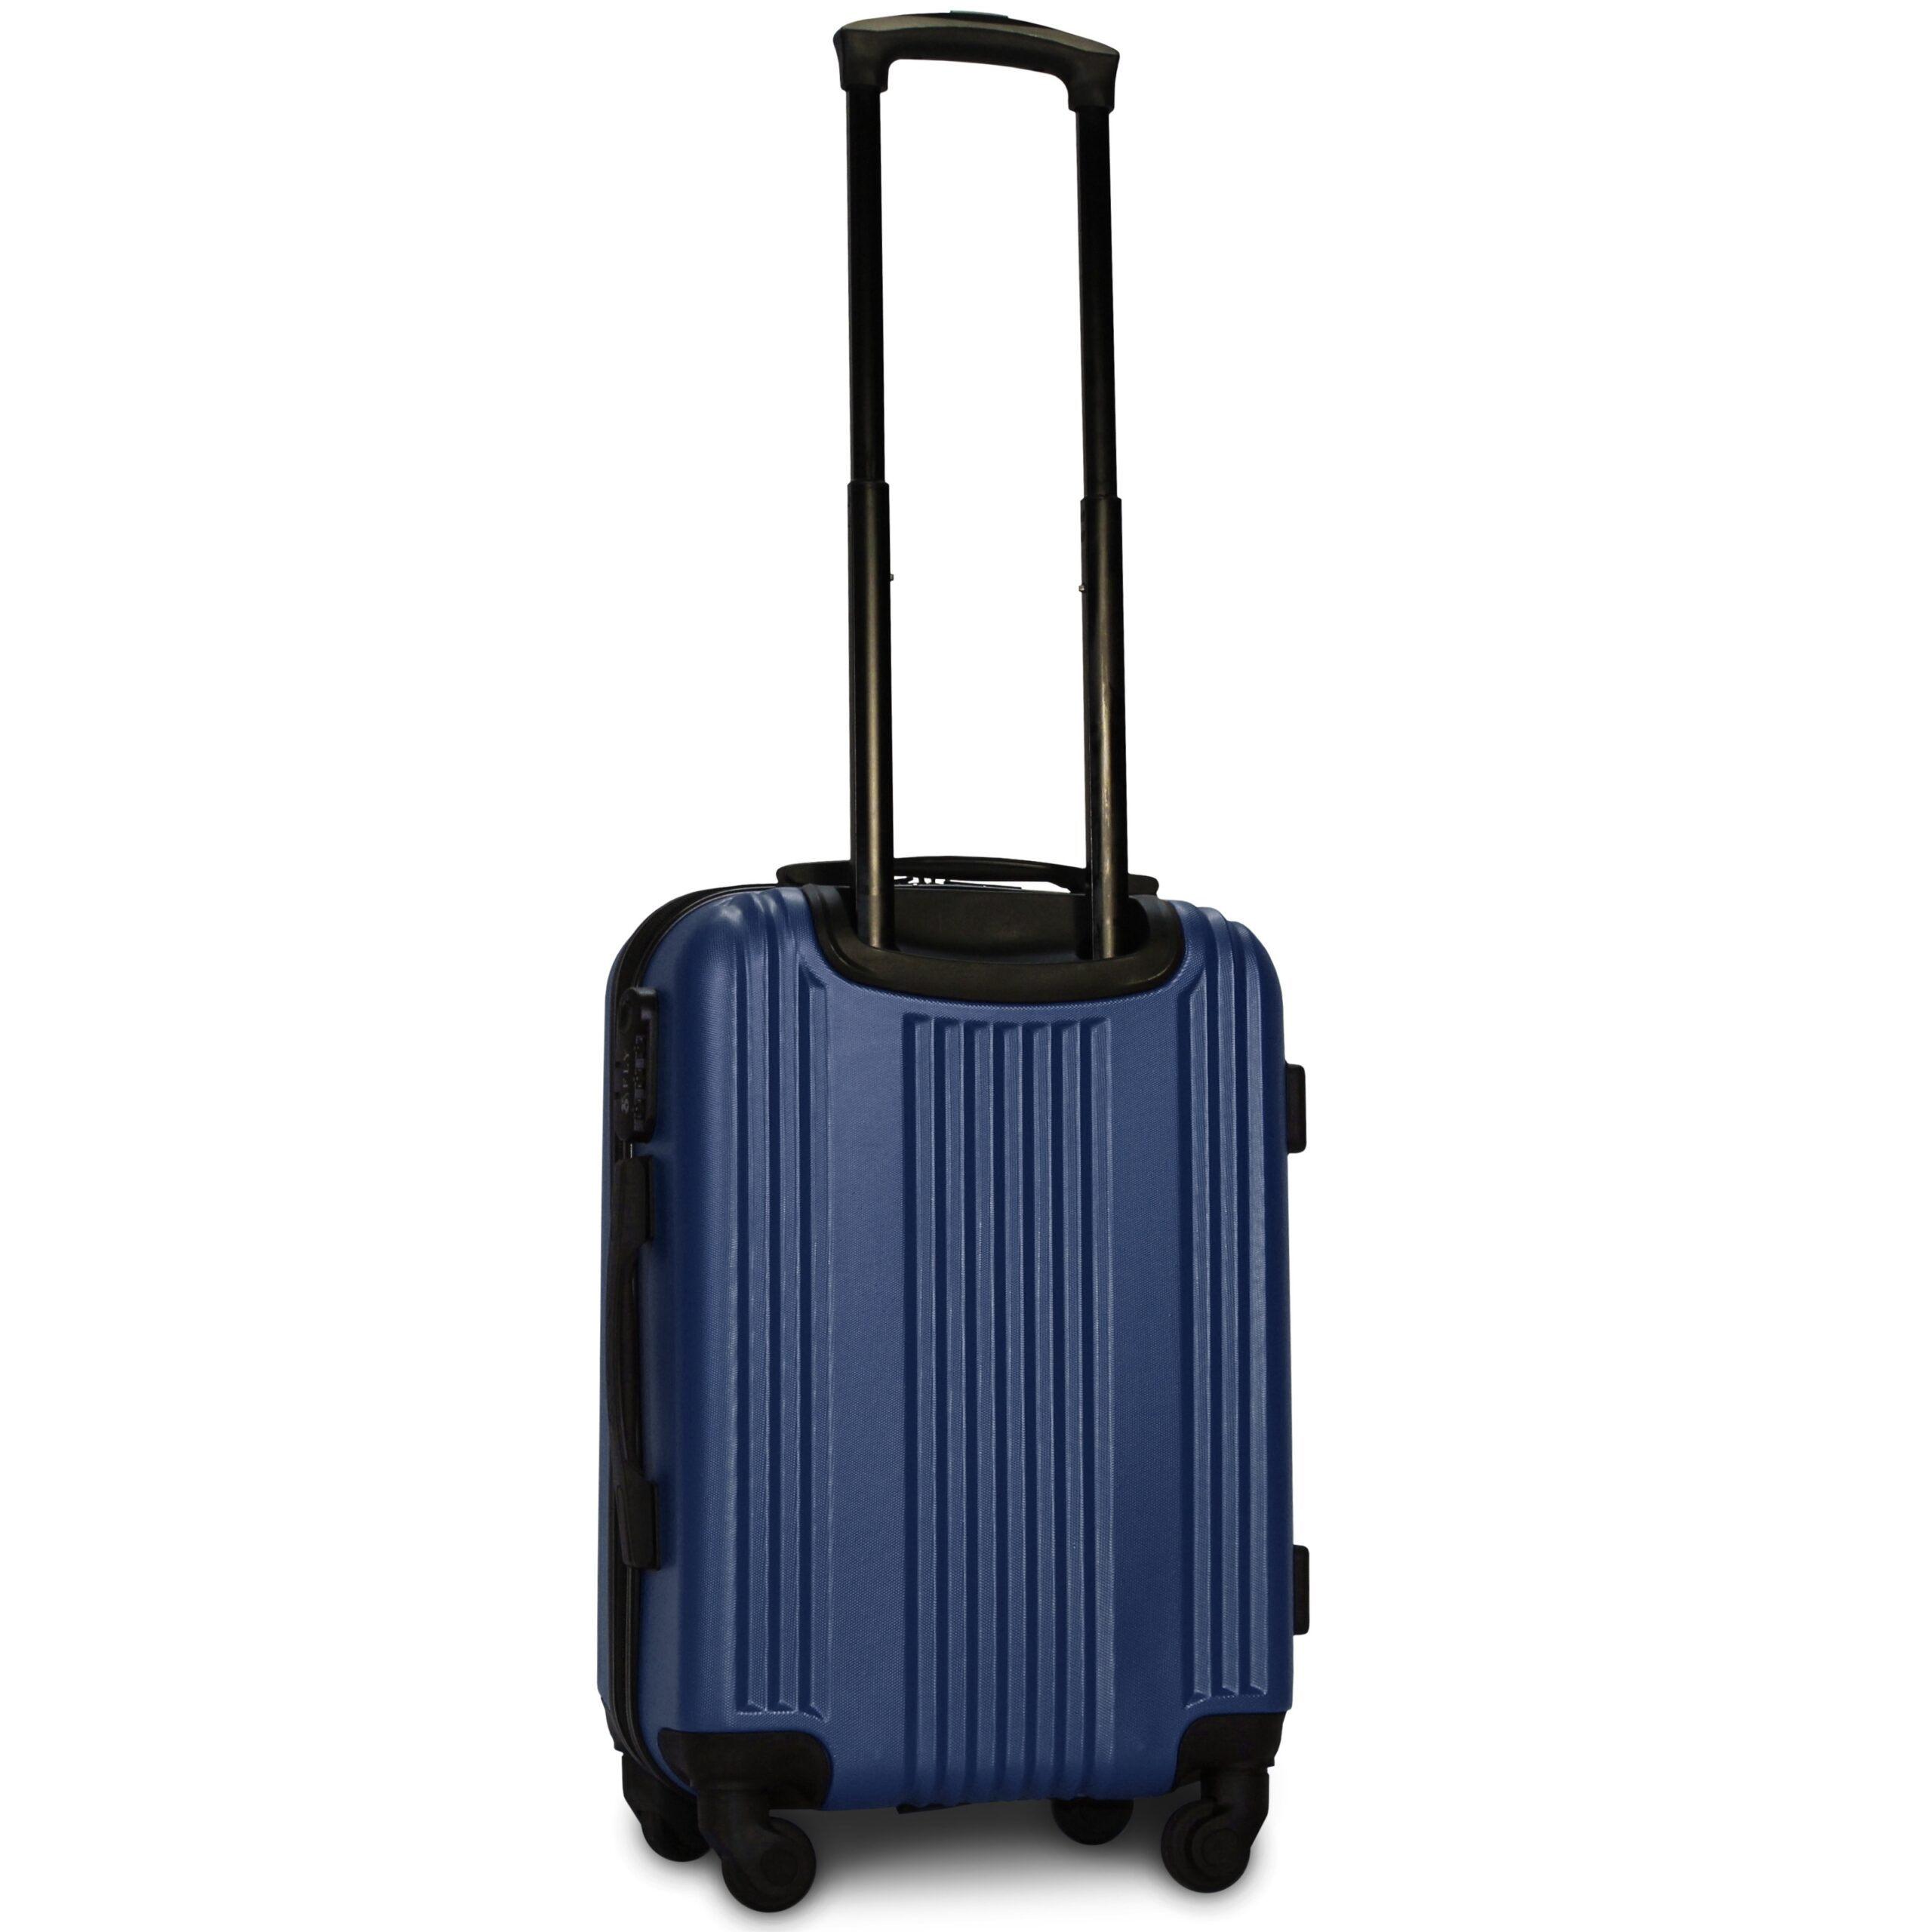 Маленький чемодан (S) Fly 614 | пластиковый